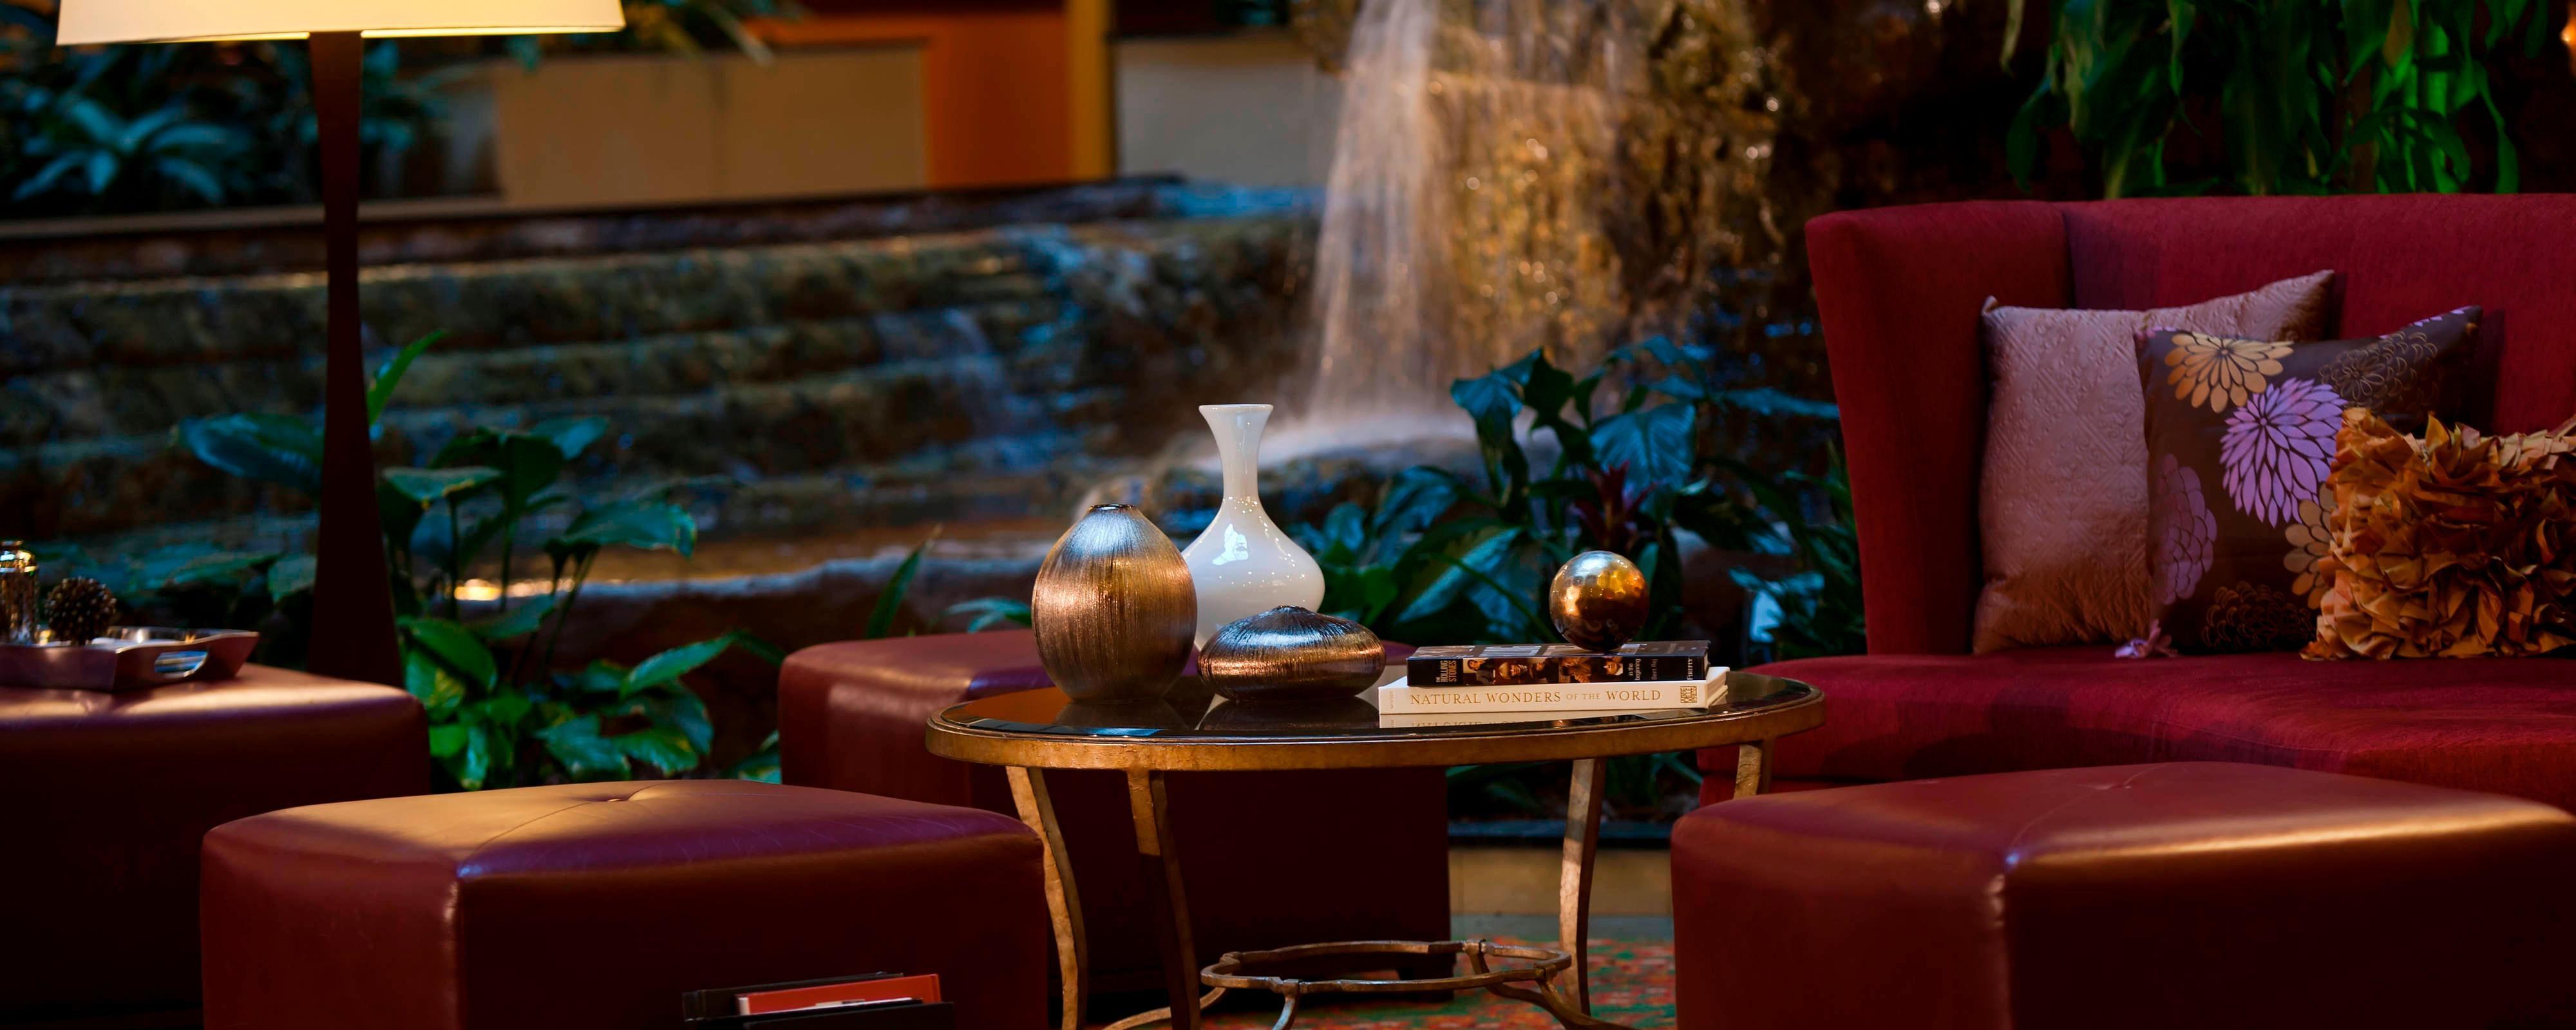 Pet Friendly Hotels Oklahoma City Renaissance Convention Center